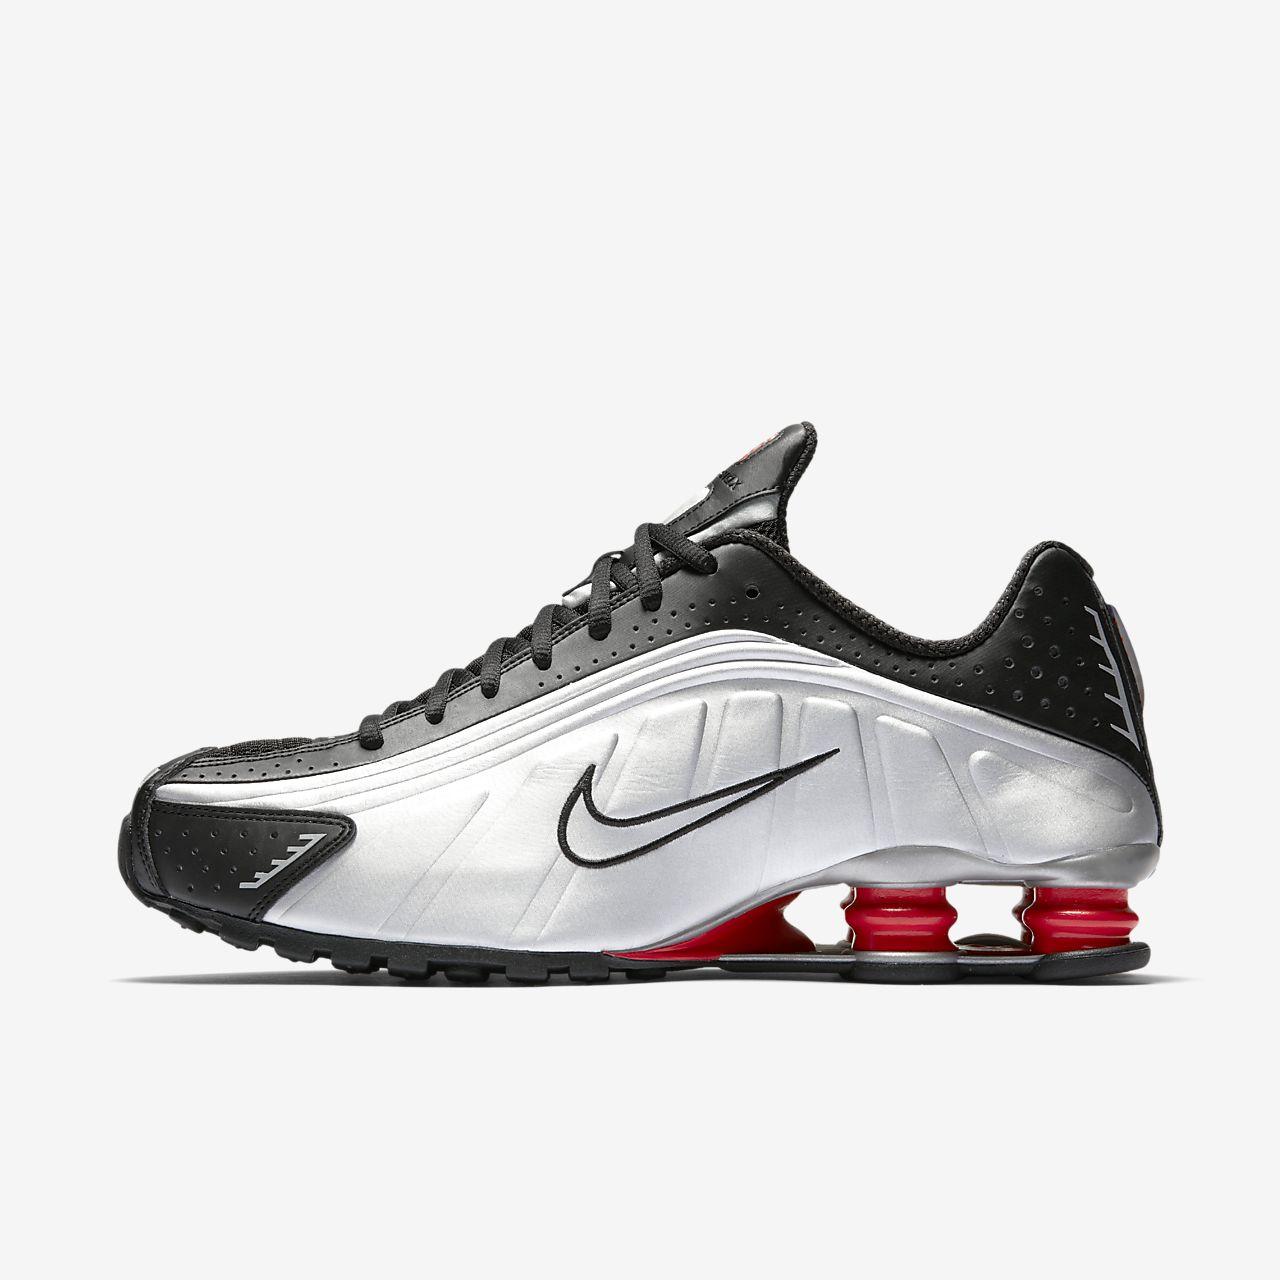 on sale a2603 60239 Low Resolution Sapatilhas Nike Shox R4 Sapatilhas Nike Shox R4